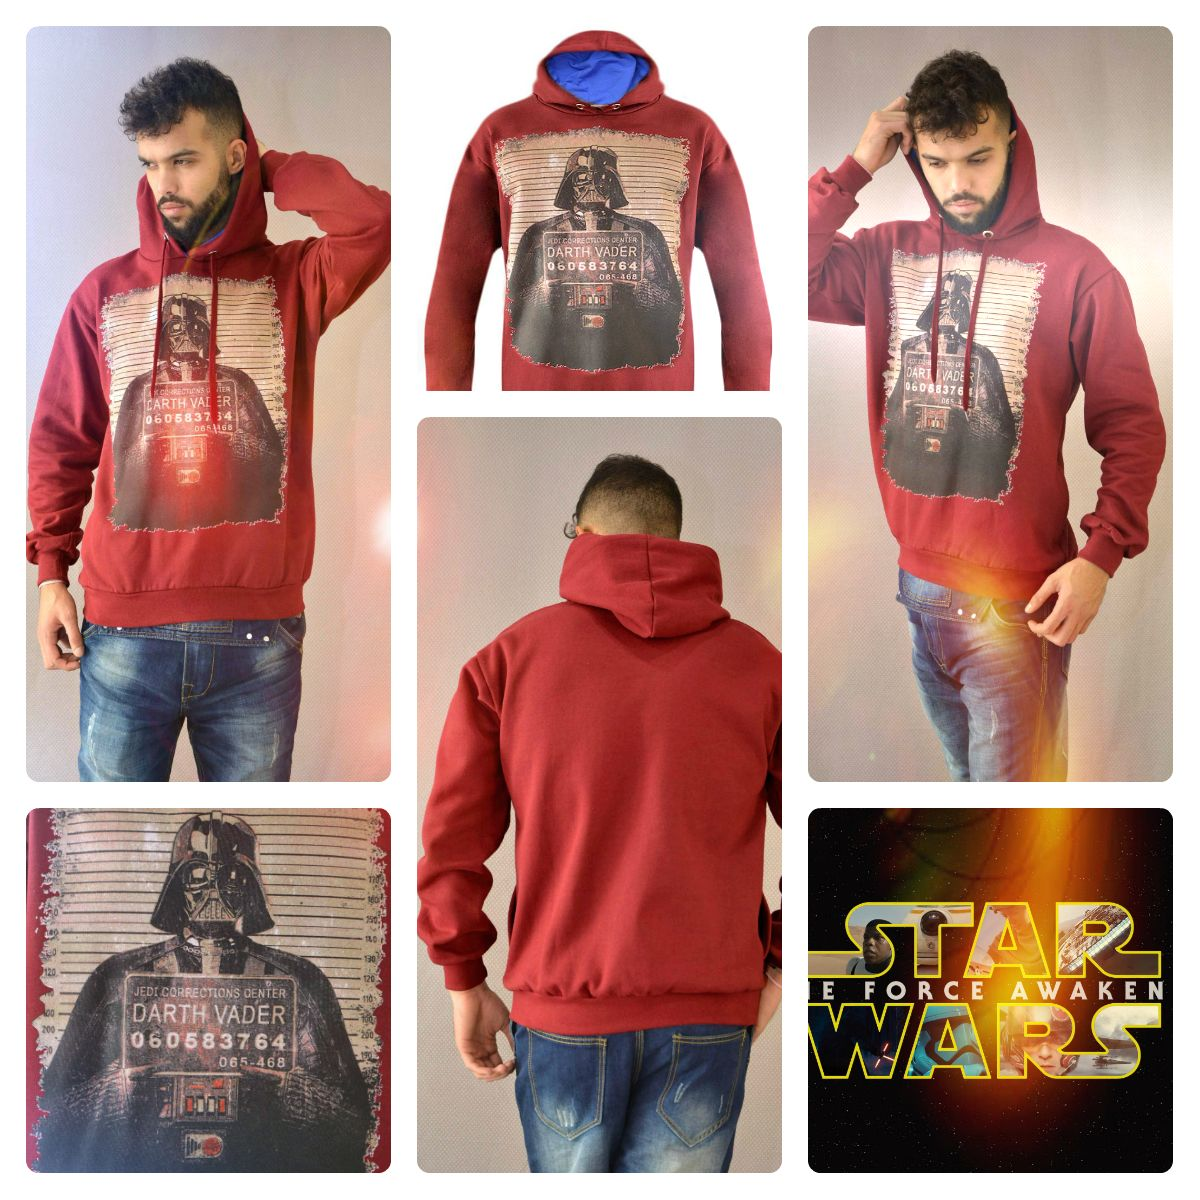 The most...WANTED!!!!! Ανδρικό μπορντό φούτερ Darth Vader. Διαθέσιμο σε: Mπορντό, Γκρι, Μαύρο!  #metaldeluxe #starwars #menfashion #menclothes #fashion #hoodies #newarrivals